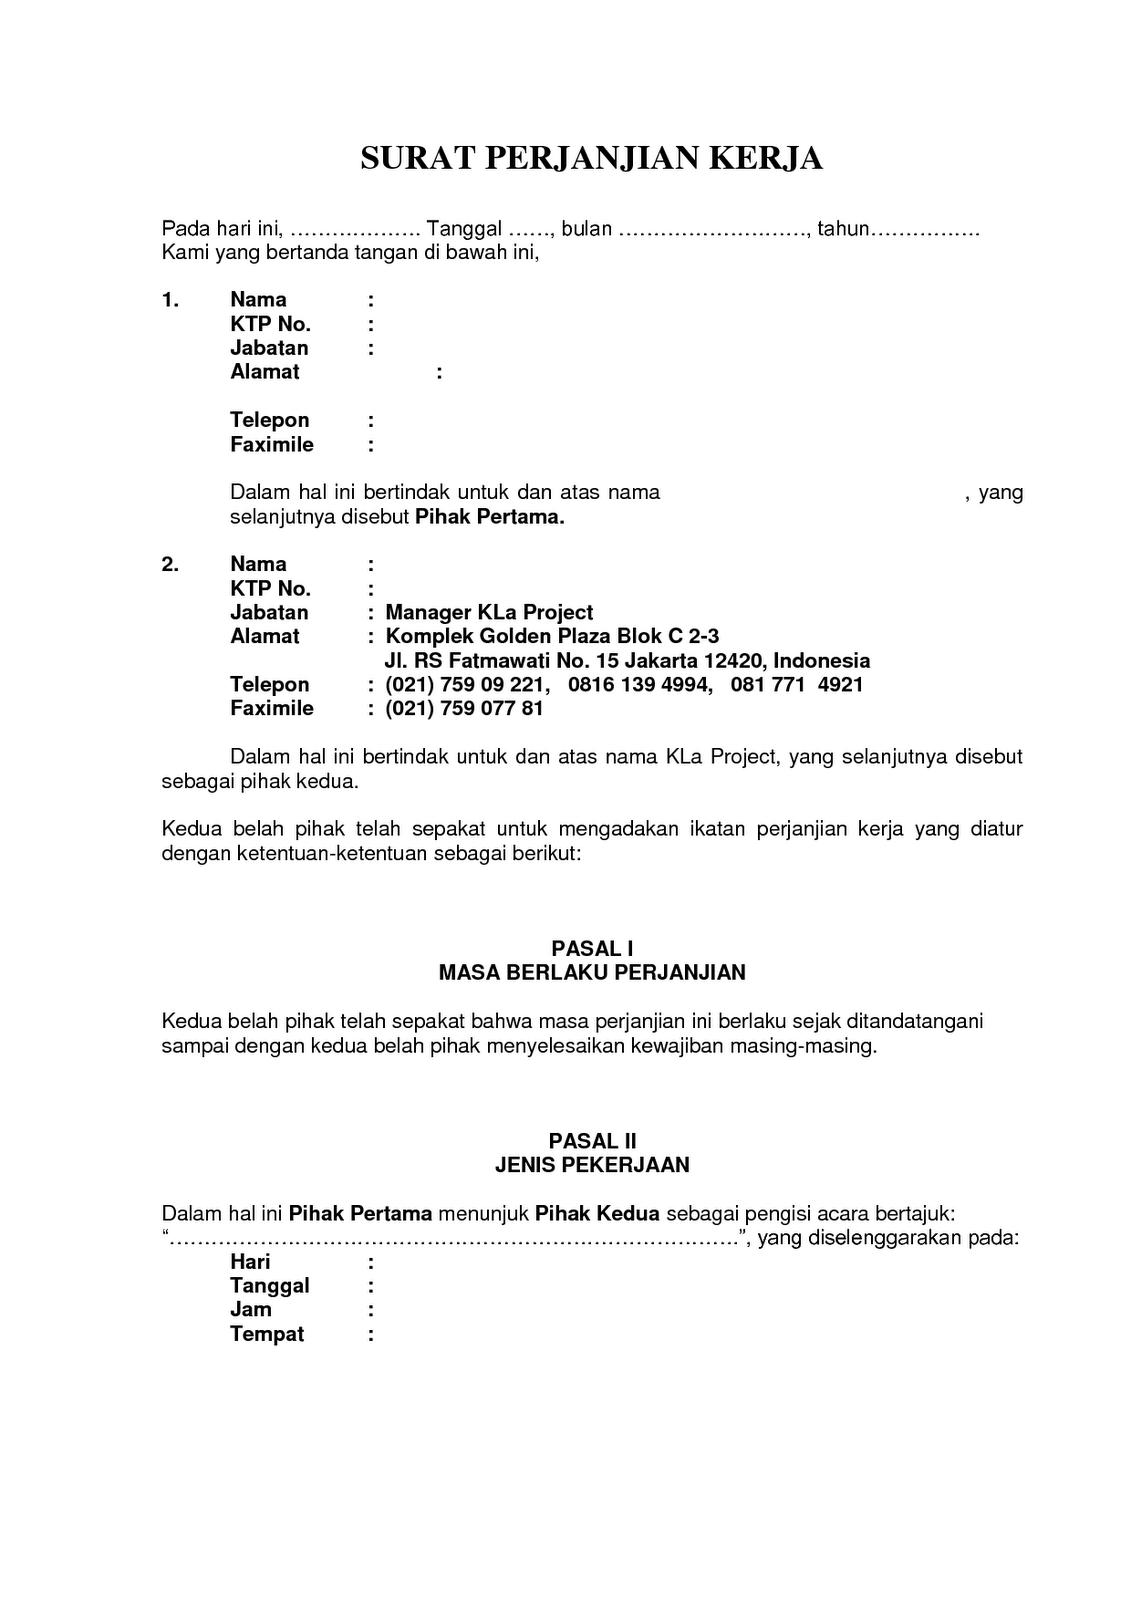 DOC Surat Perjanjian Kerja - Kla Project